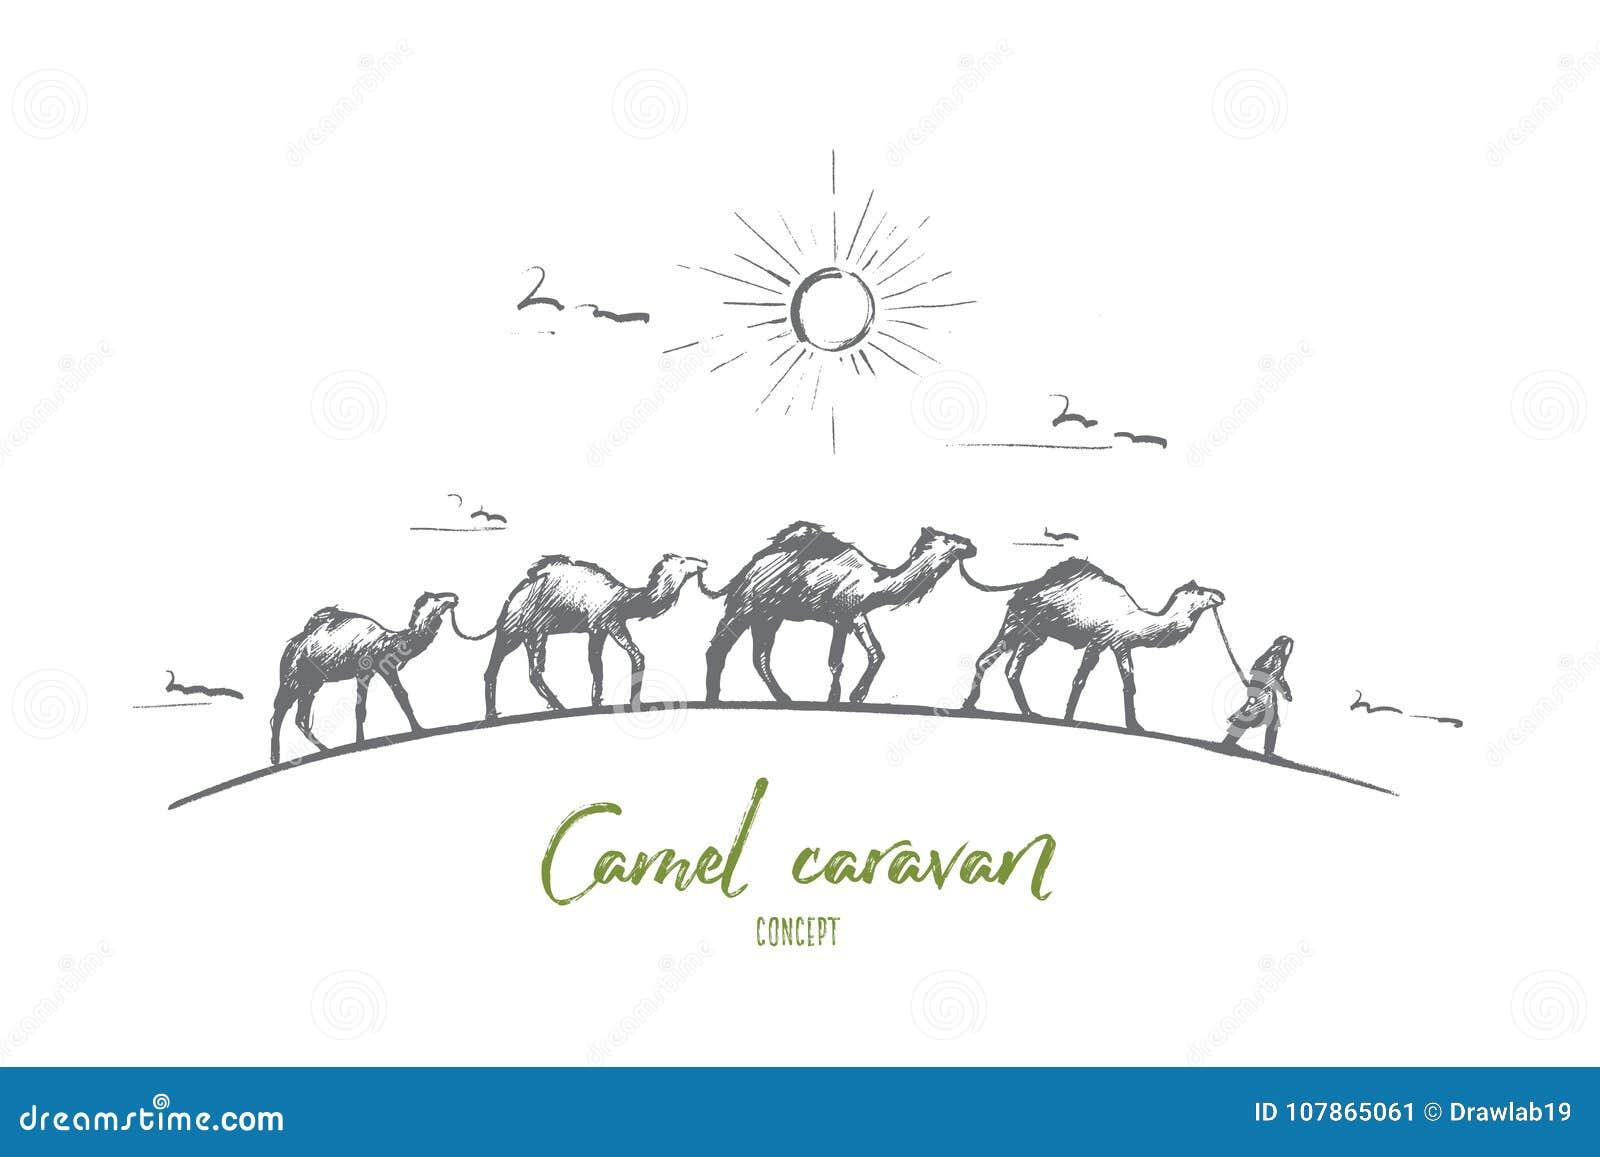 Camel caravan concept. Hand drawn isolated vector.